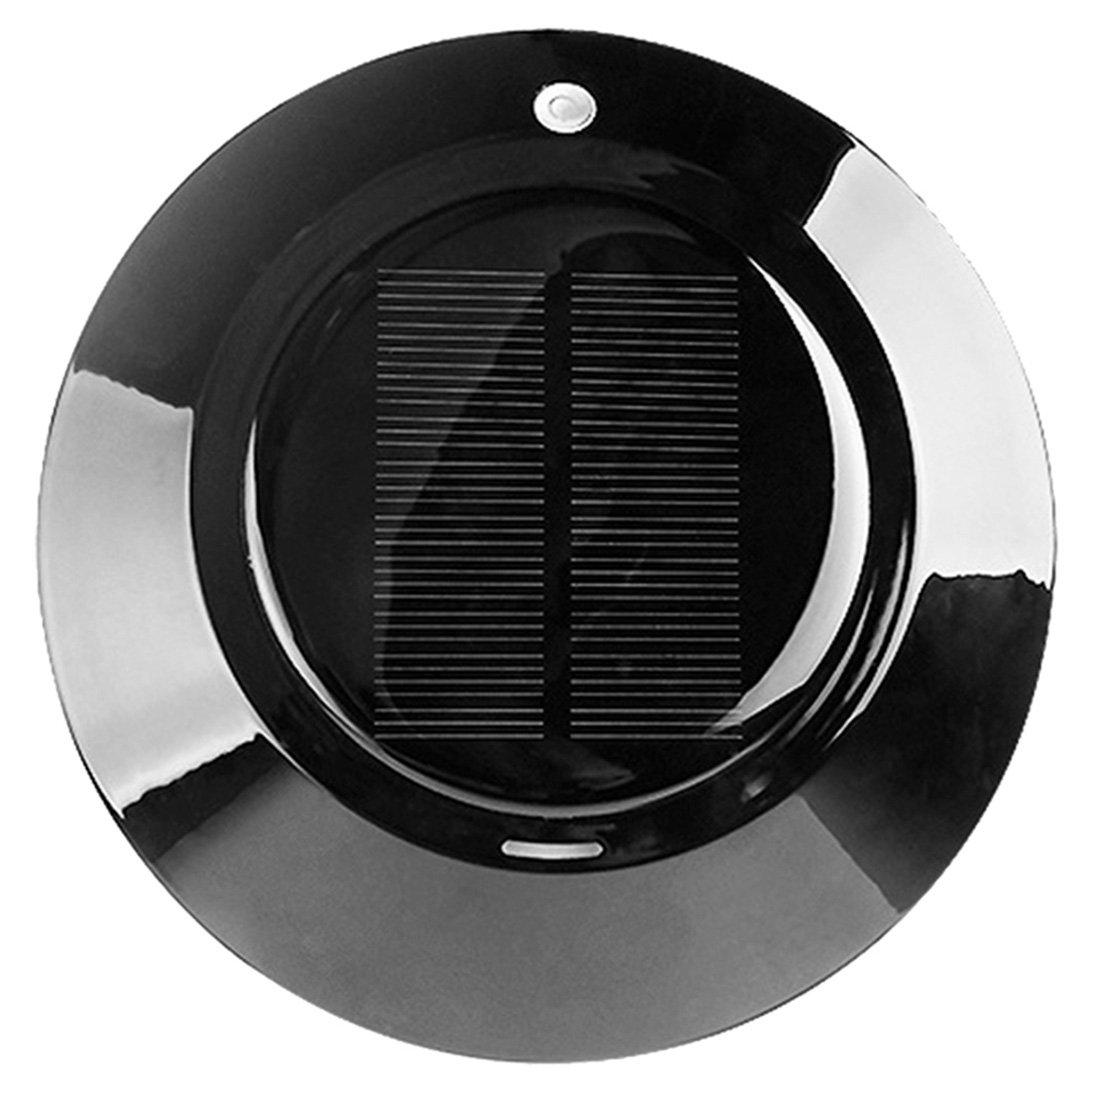 ACS UFO-Solar Energy Car Use Air Cleaner Anion PM2.5 Air Purifier (Black)